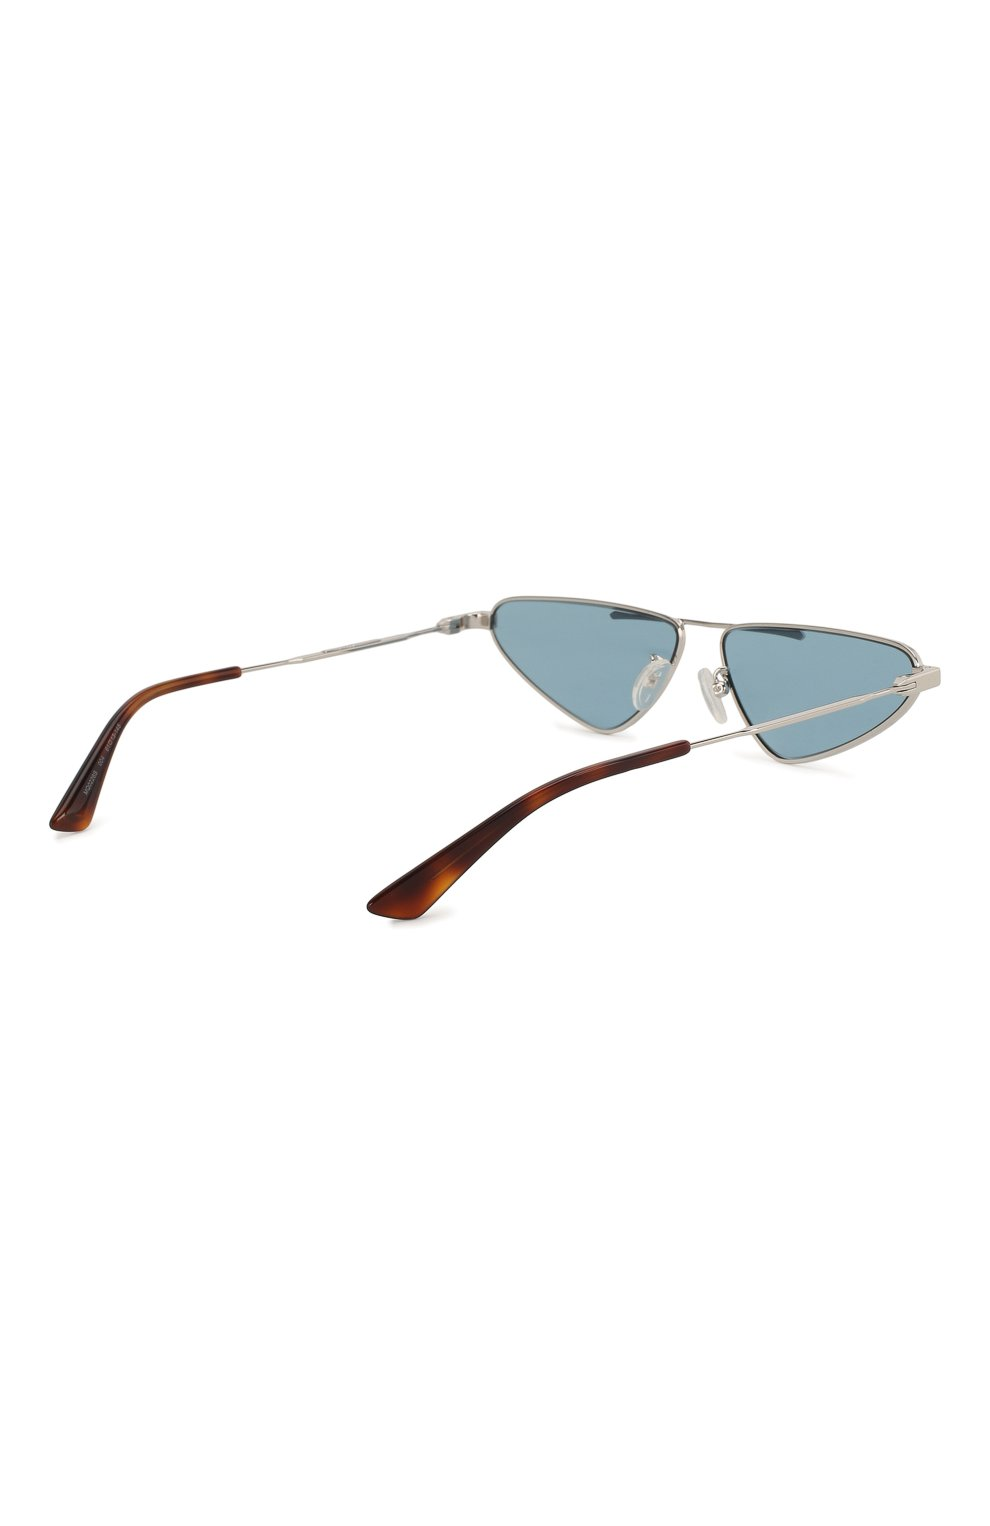 Женские солнцезащитные очки MCQ SWALLOW голубого цвета, арт. MQ0226 004 | Фото 5 (Тип очков: С/з; Статус проверки: Проверена категория; Оптика Гендер: оптика-унисекс; Очки форма: Узкие, D-форма)